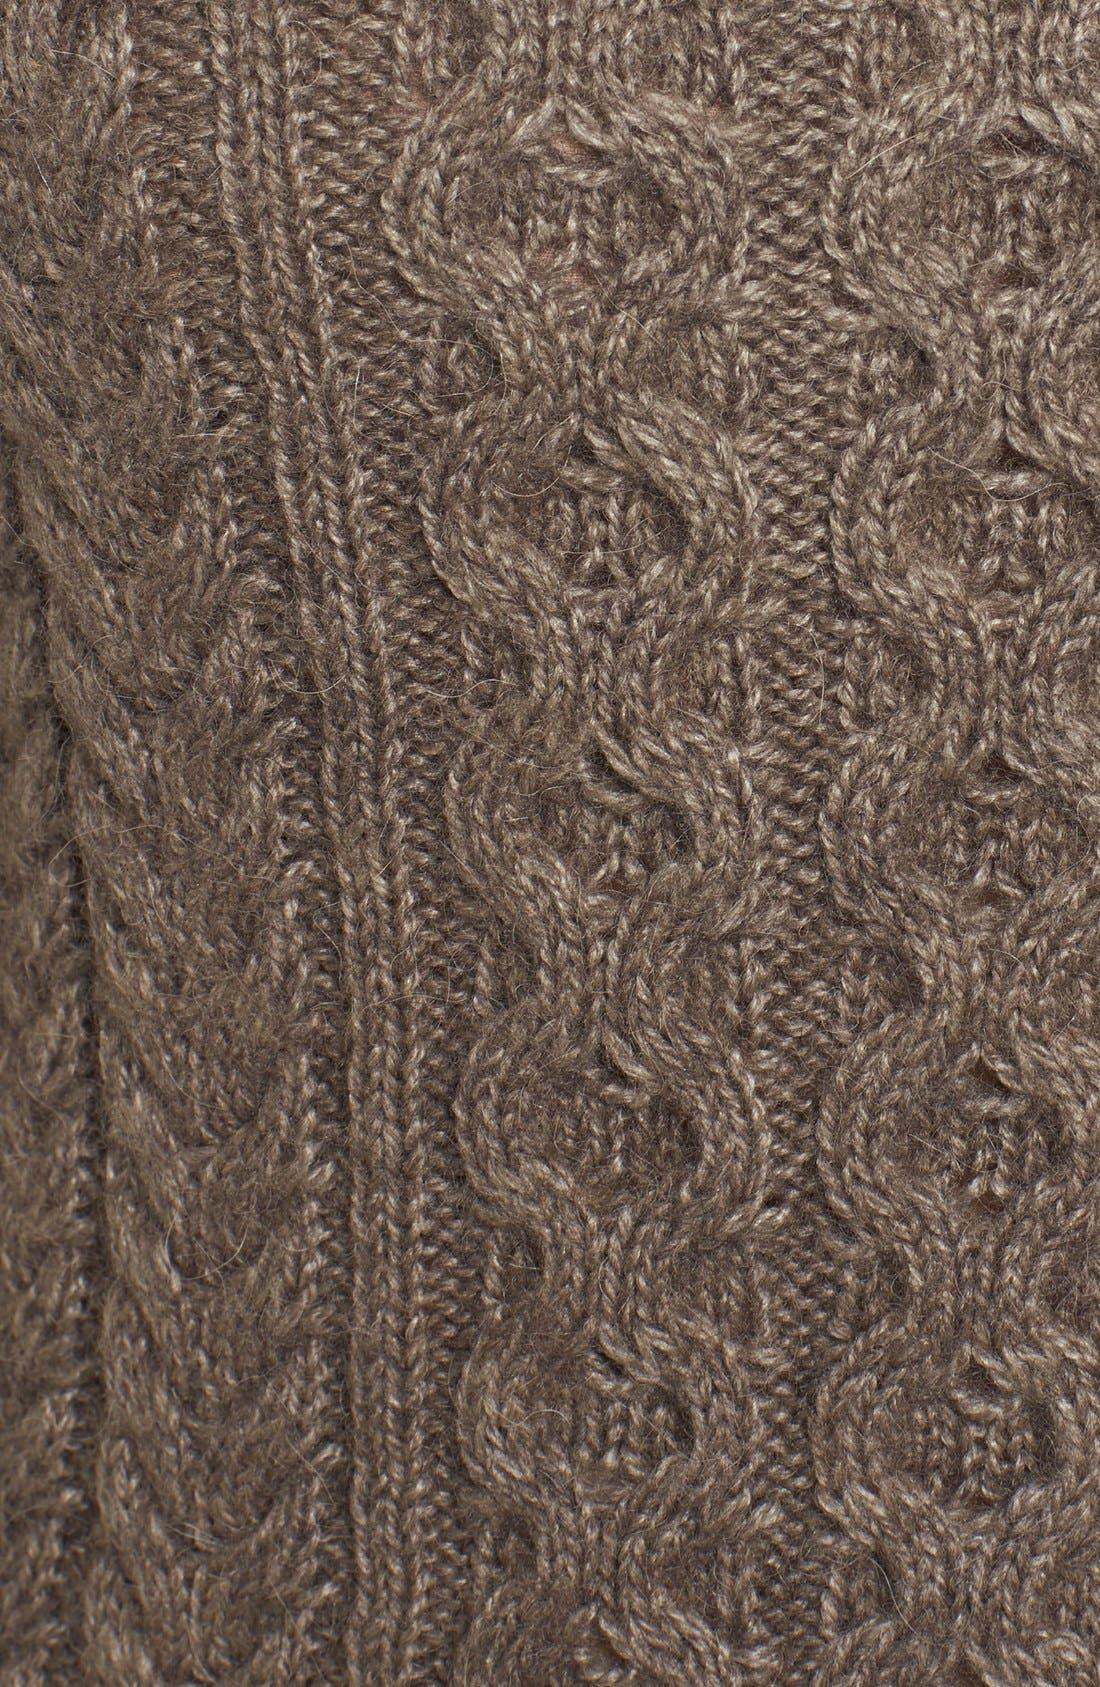 Cable Knit Crewneck Sweater,                             Alternate thumbnail 4, color,                             270